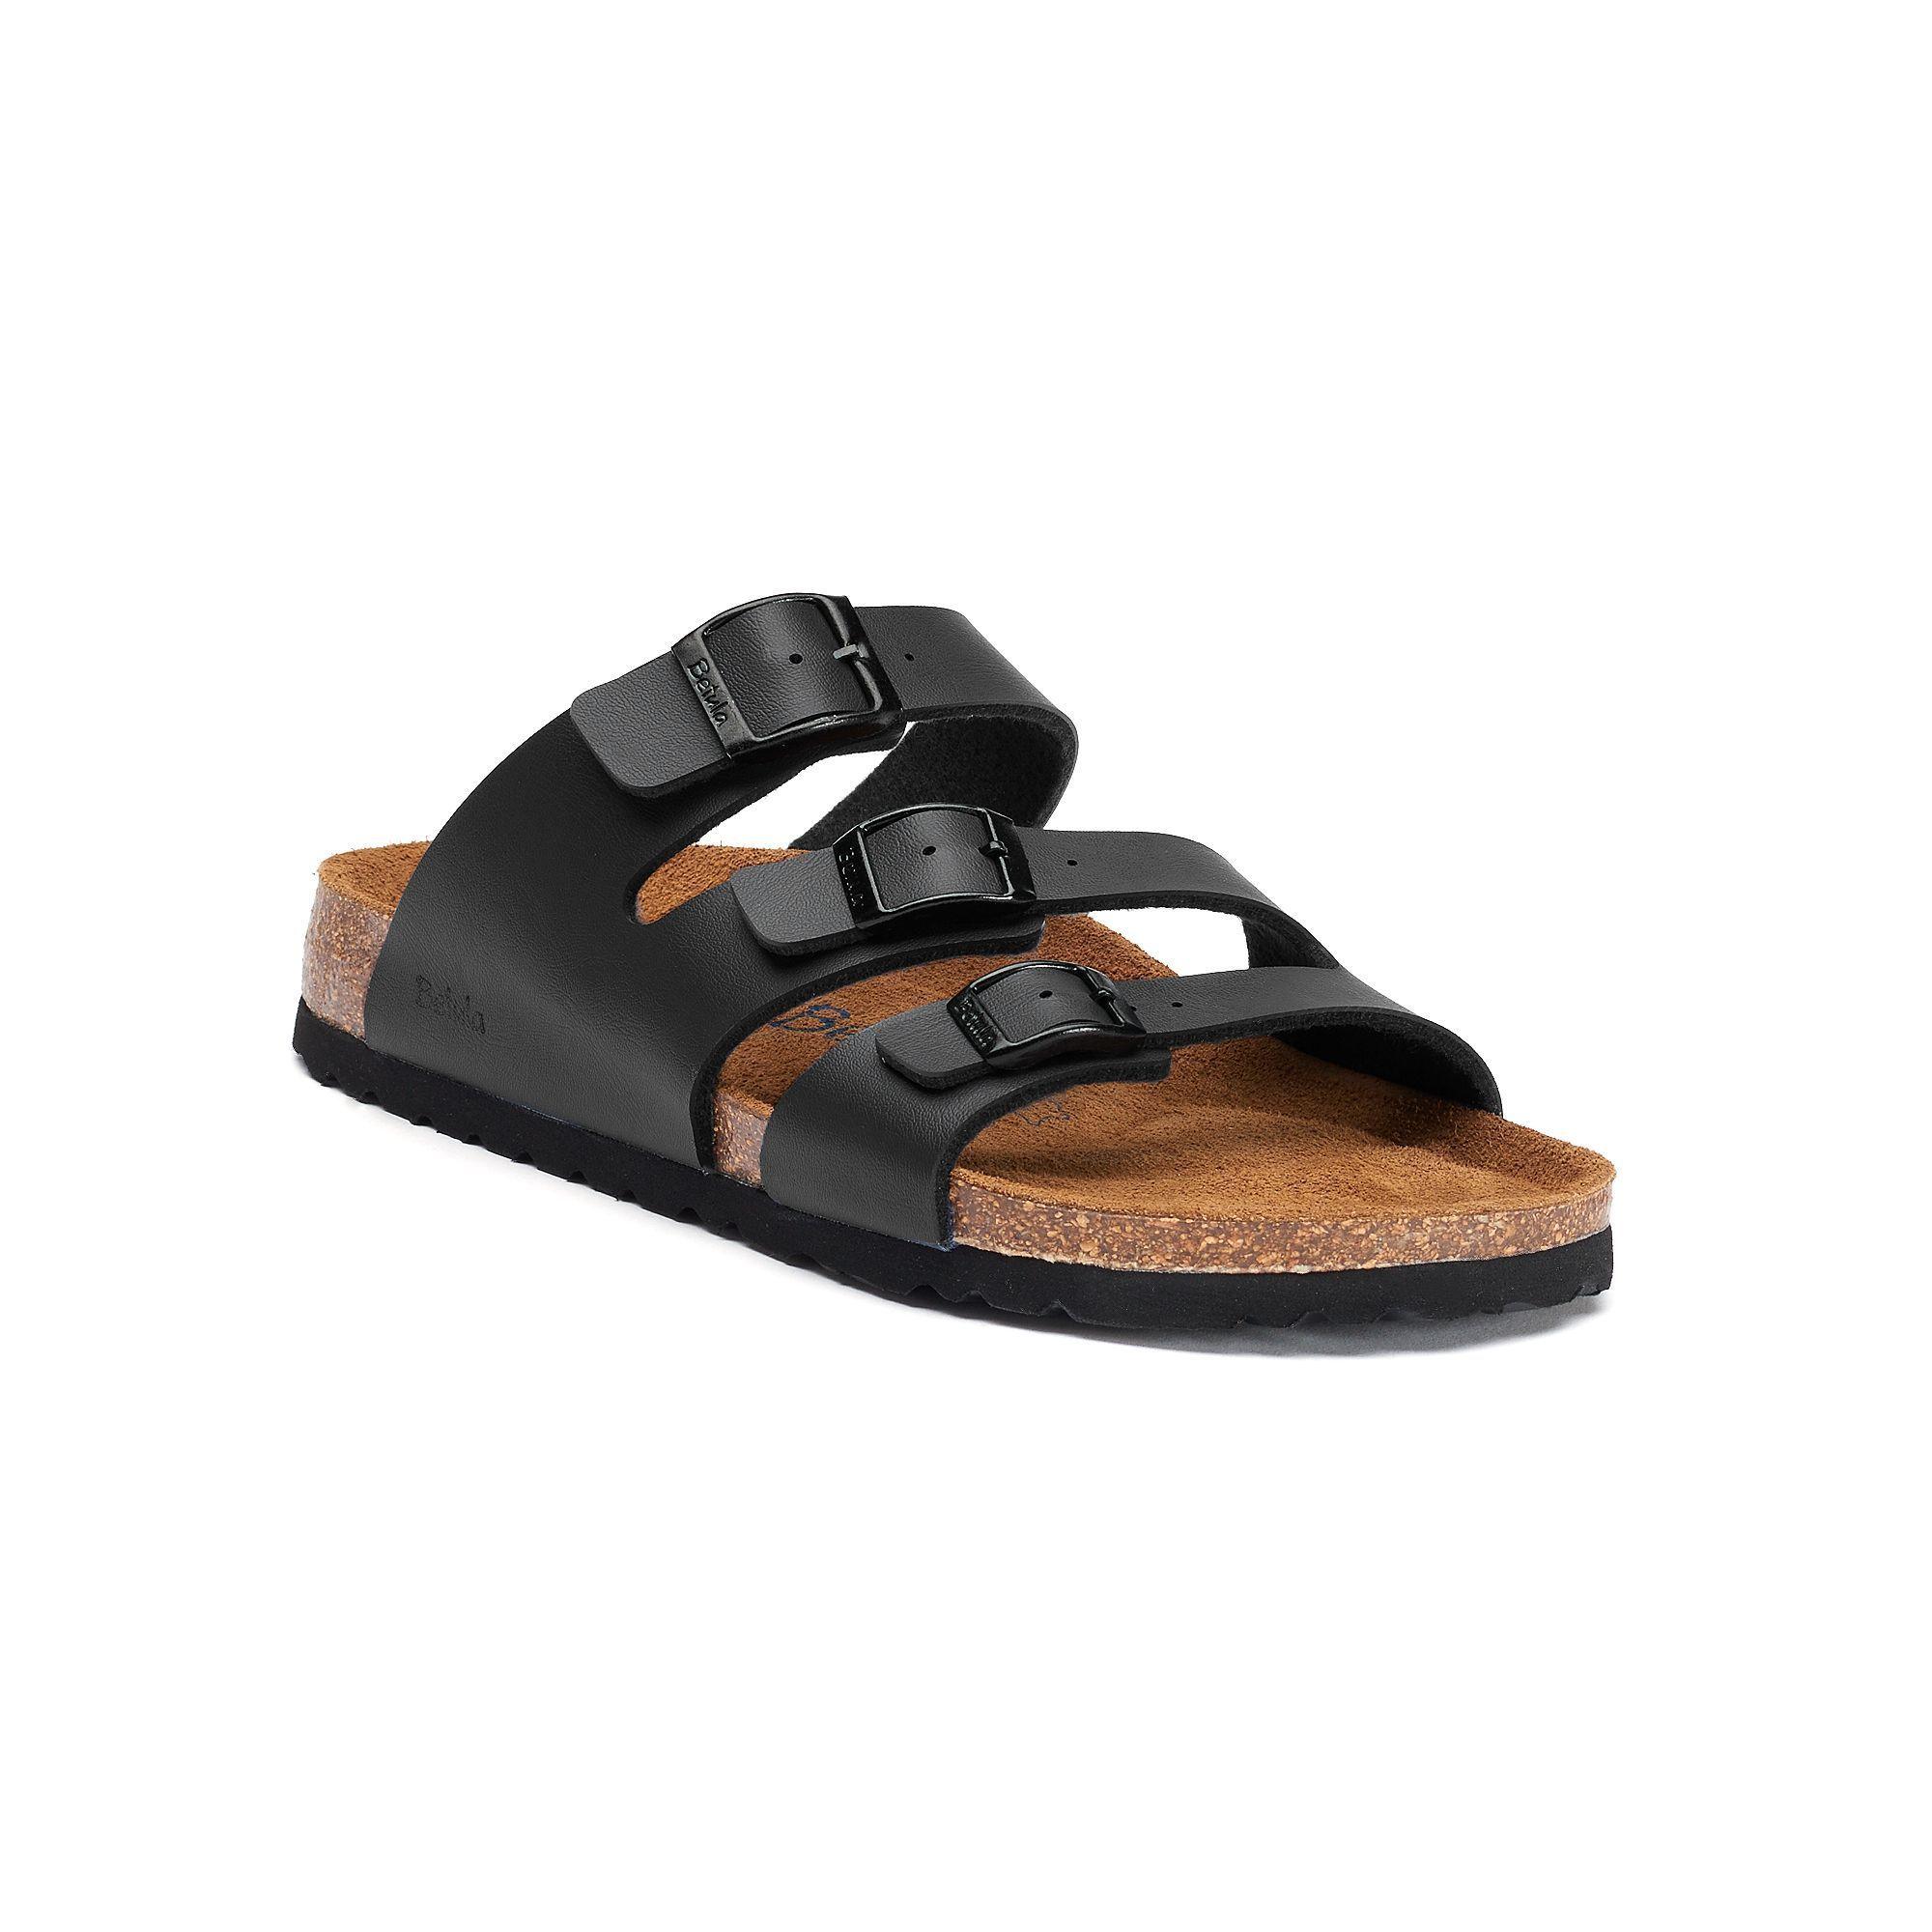 Betula Licensed by Birkenstock Leo Women's Footbed Sandals